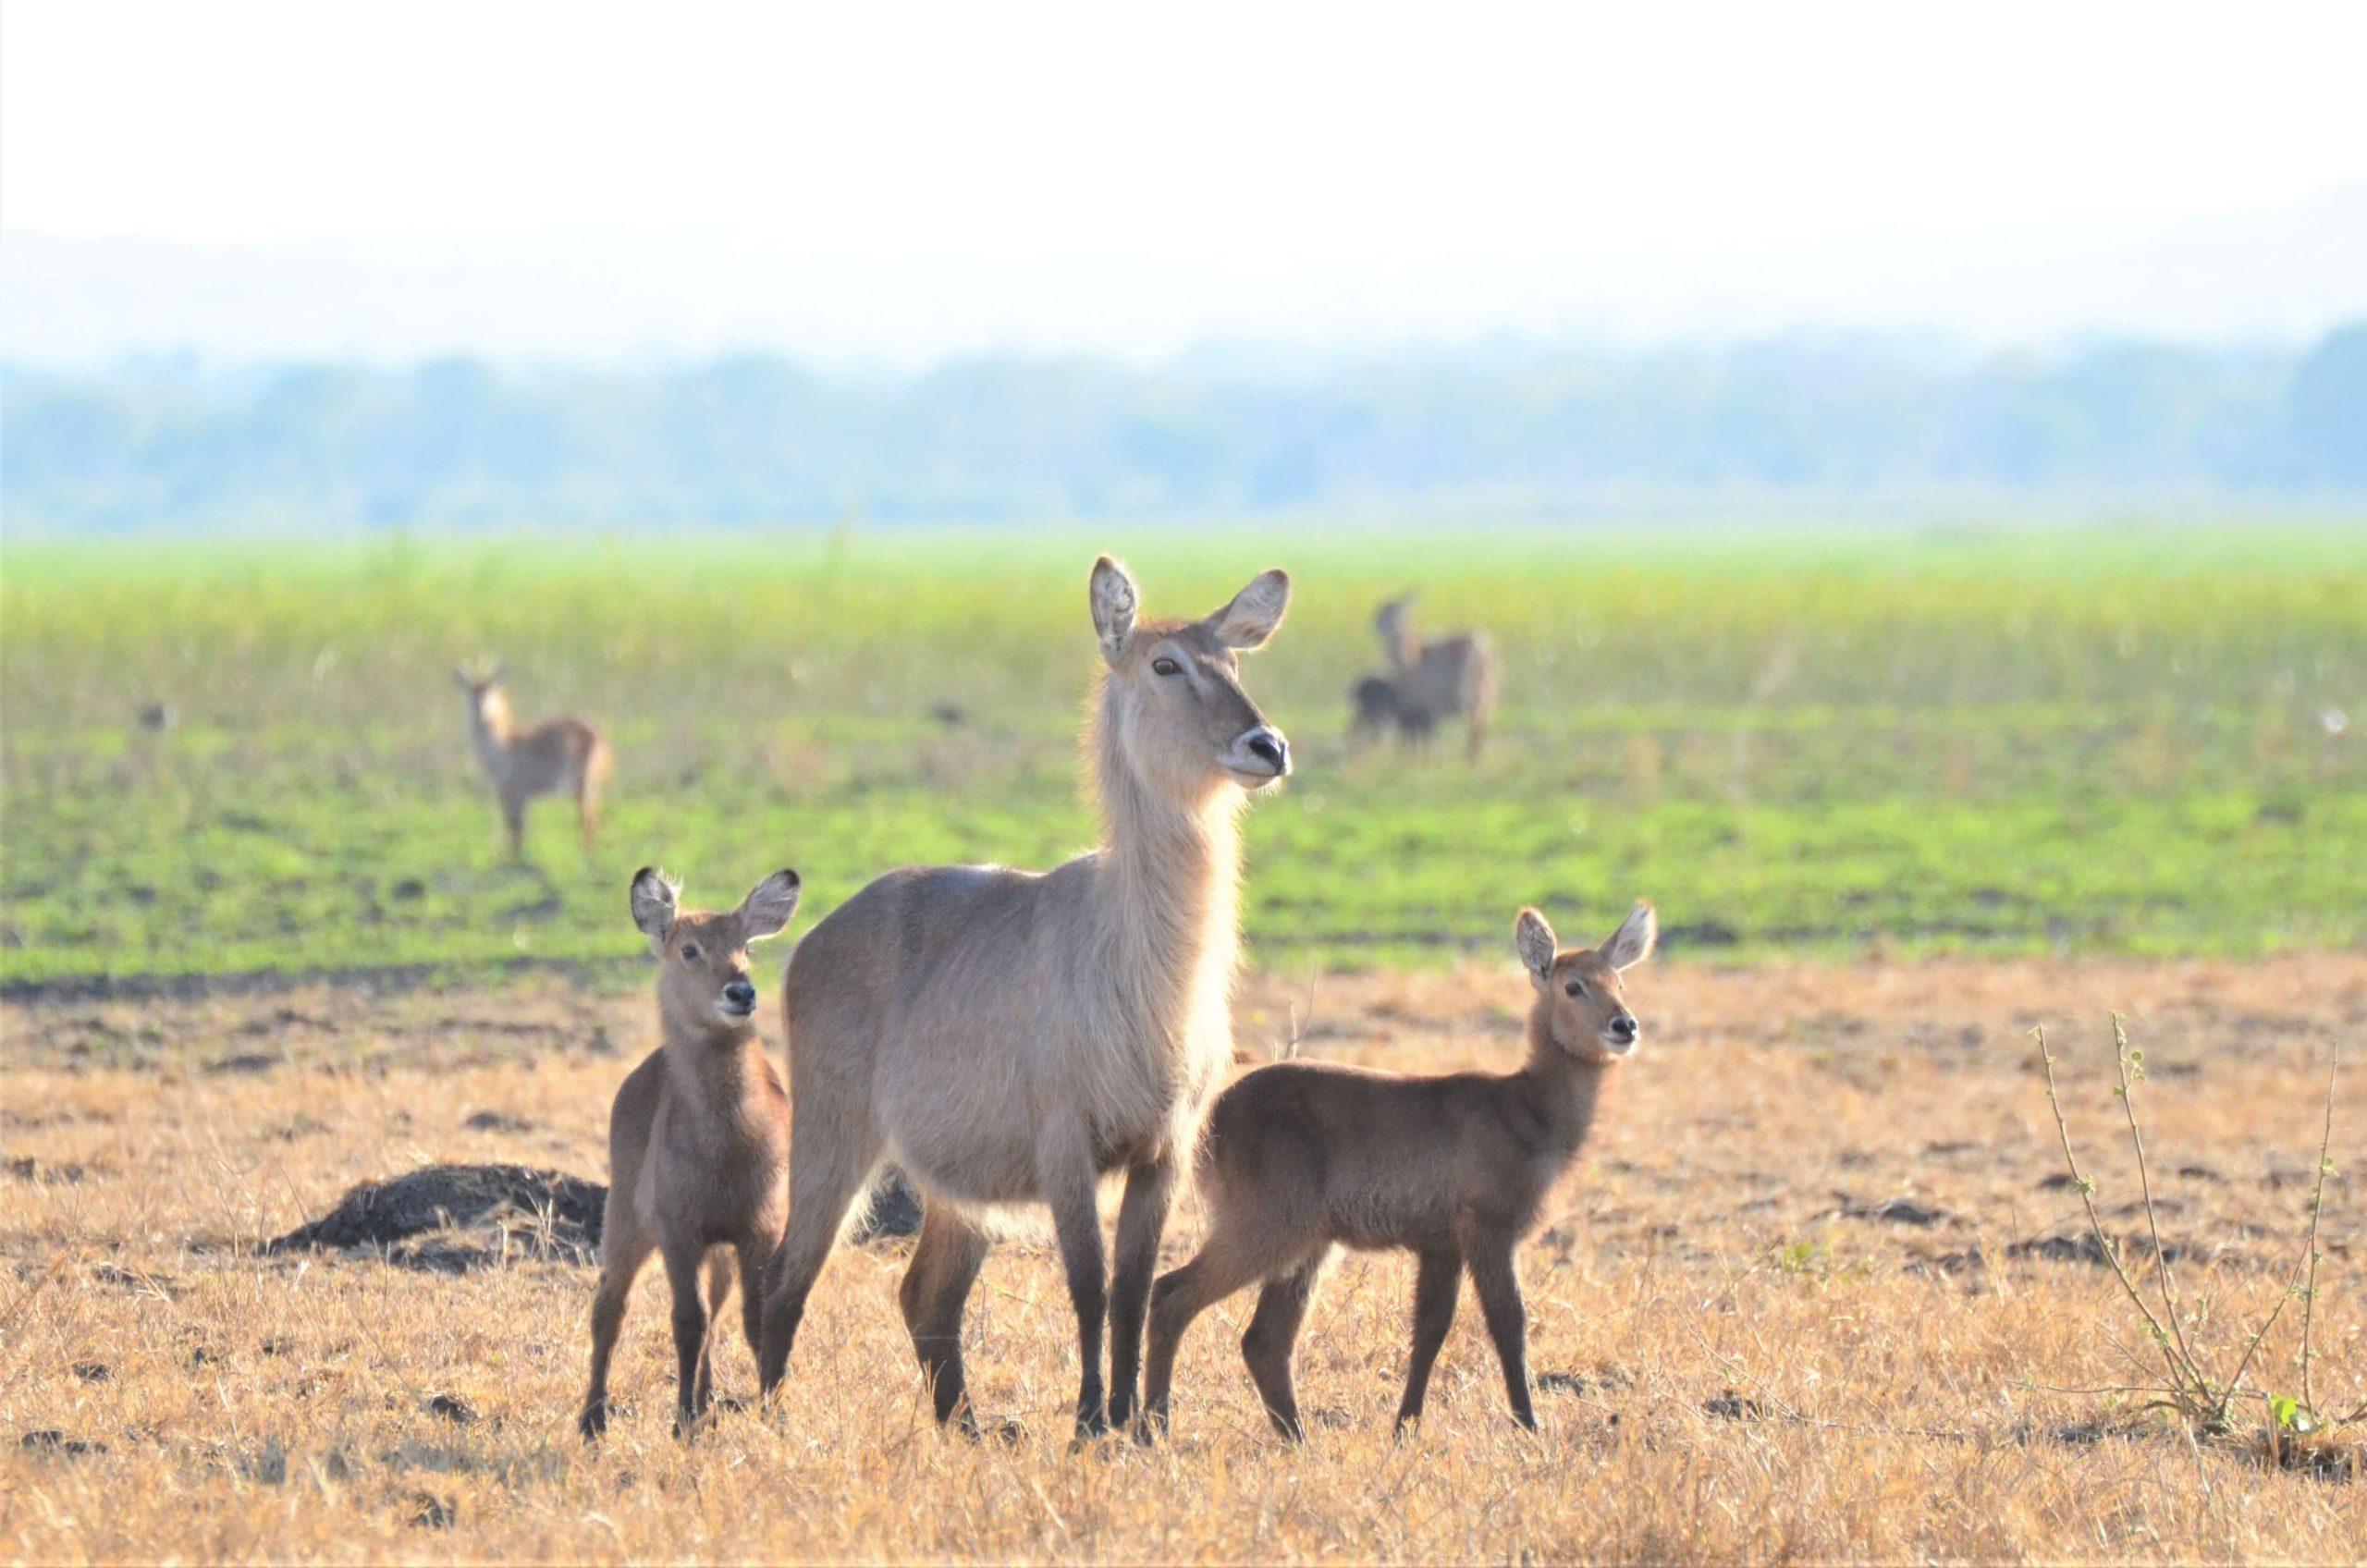 Waterbuck in Liwonde National Park